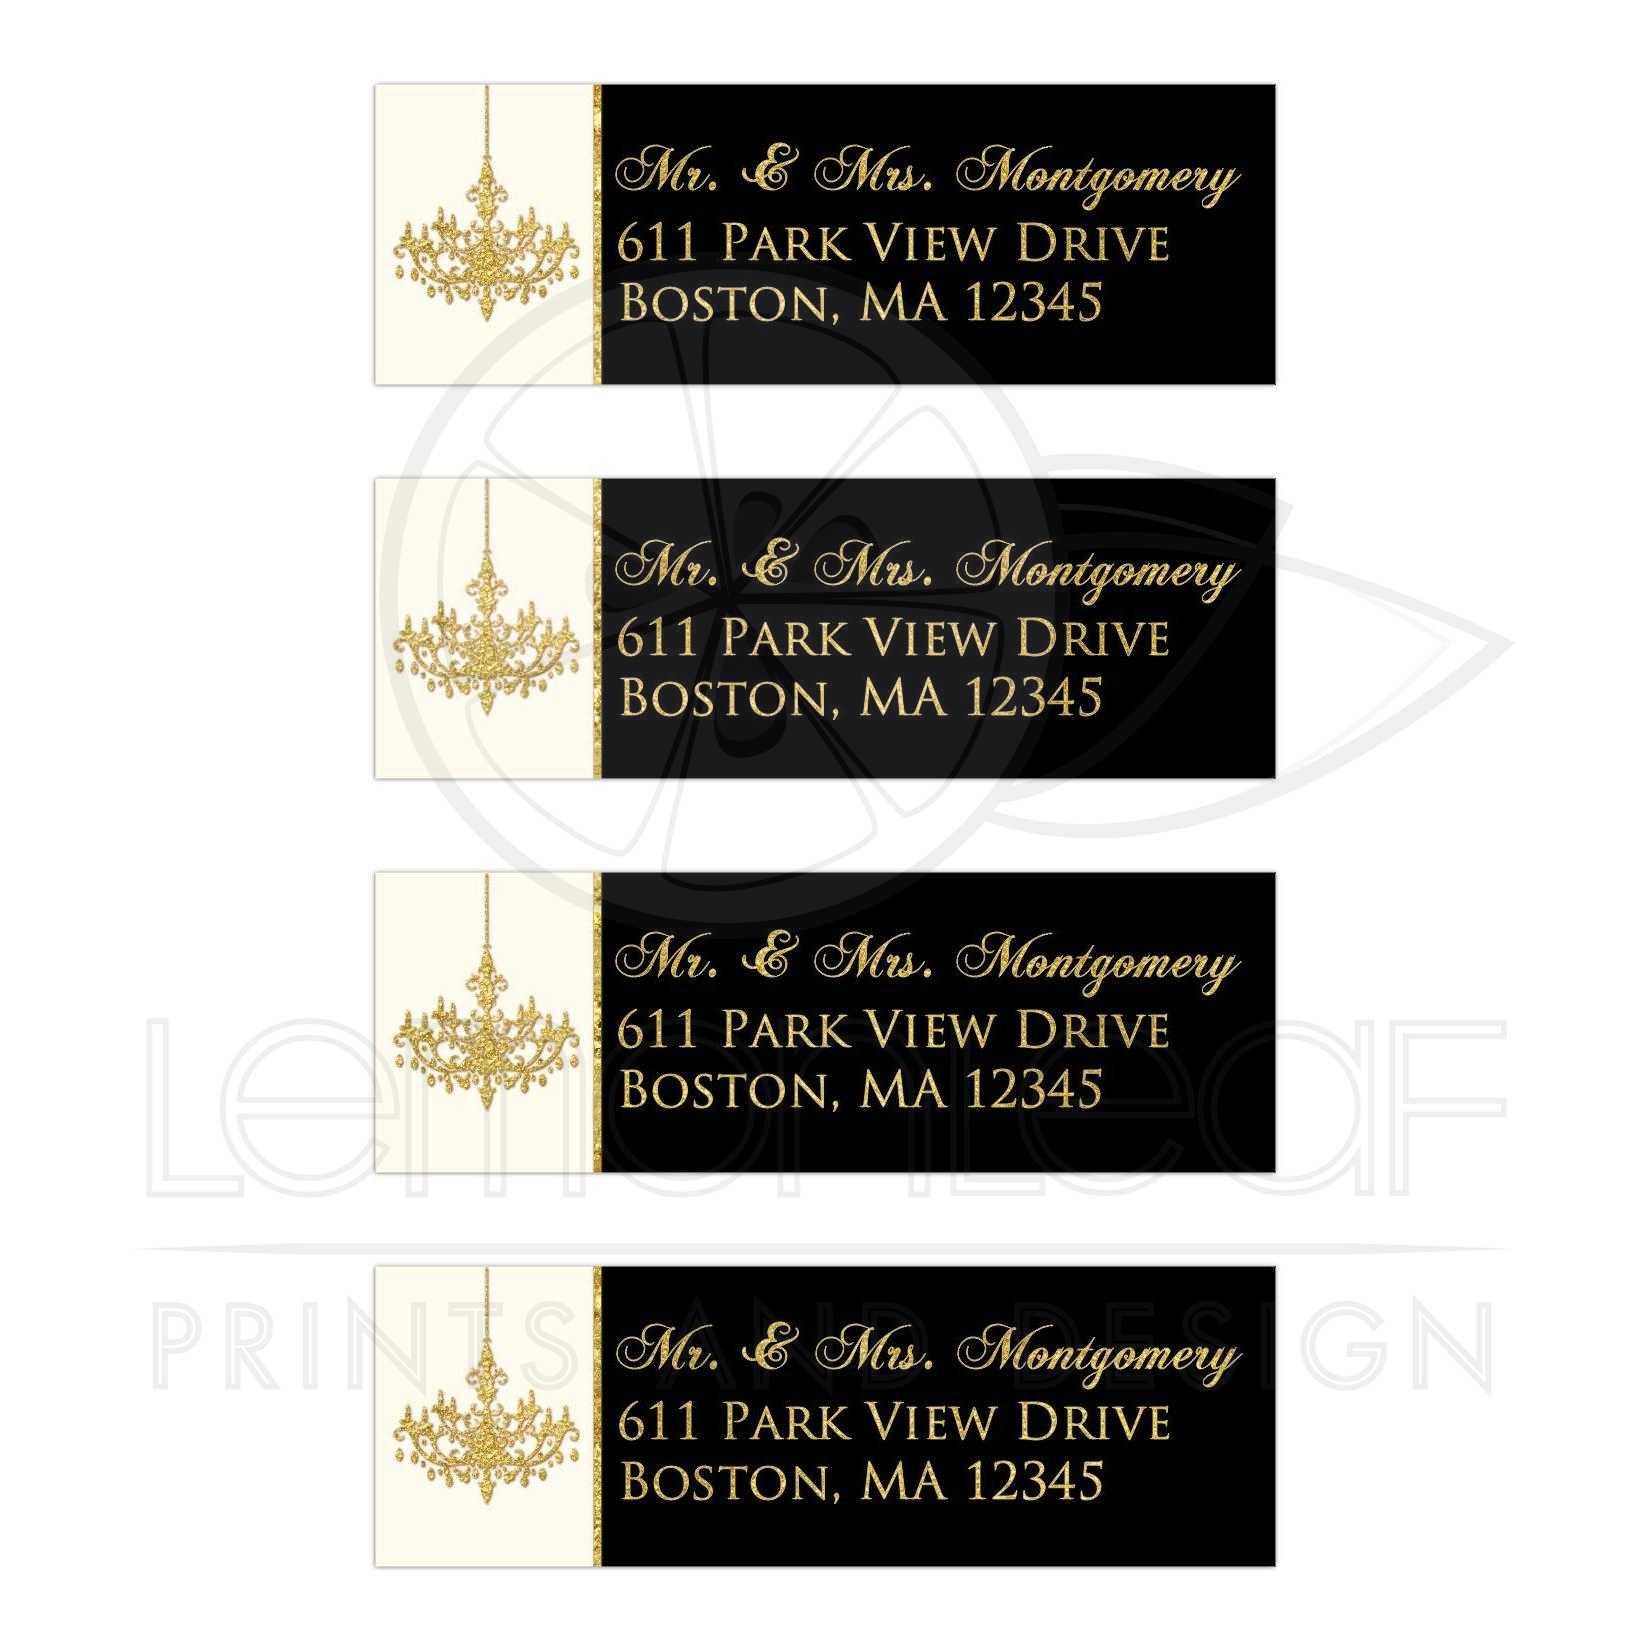 Formal invitation return address image collections for Return address on wedding invitations sample